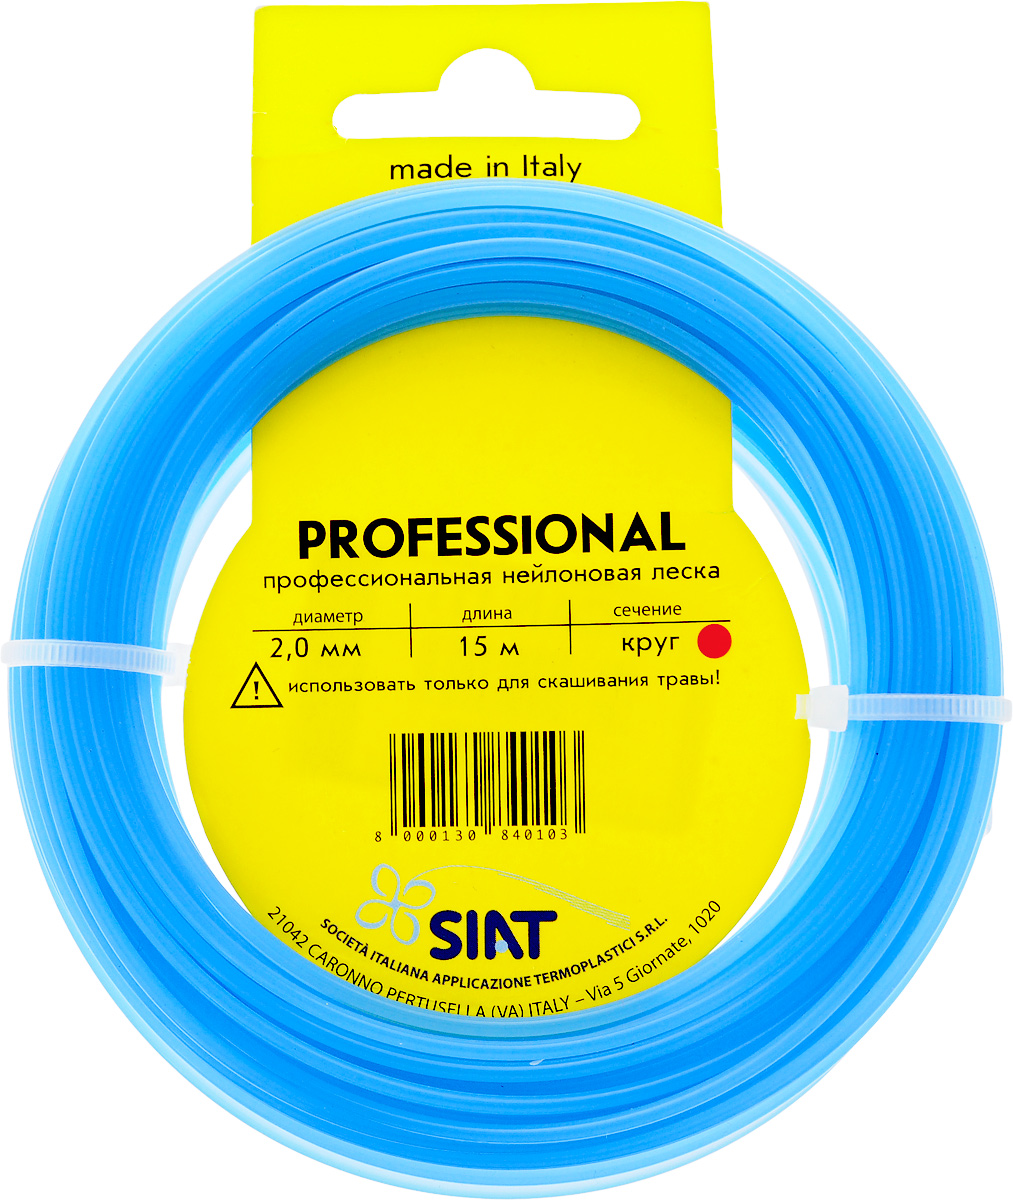 Леска для триммера Siat Professional Siat. Круг, диаметр 2 мм, длина 15 м леска для триммера siat professional siat квадрат цвет красный диаметр 2 мм длина 15 м